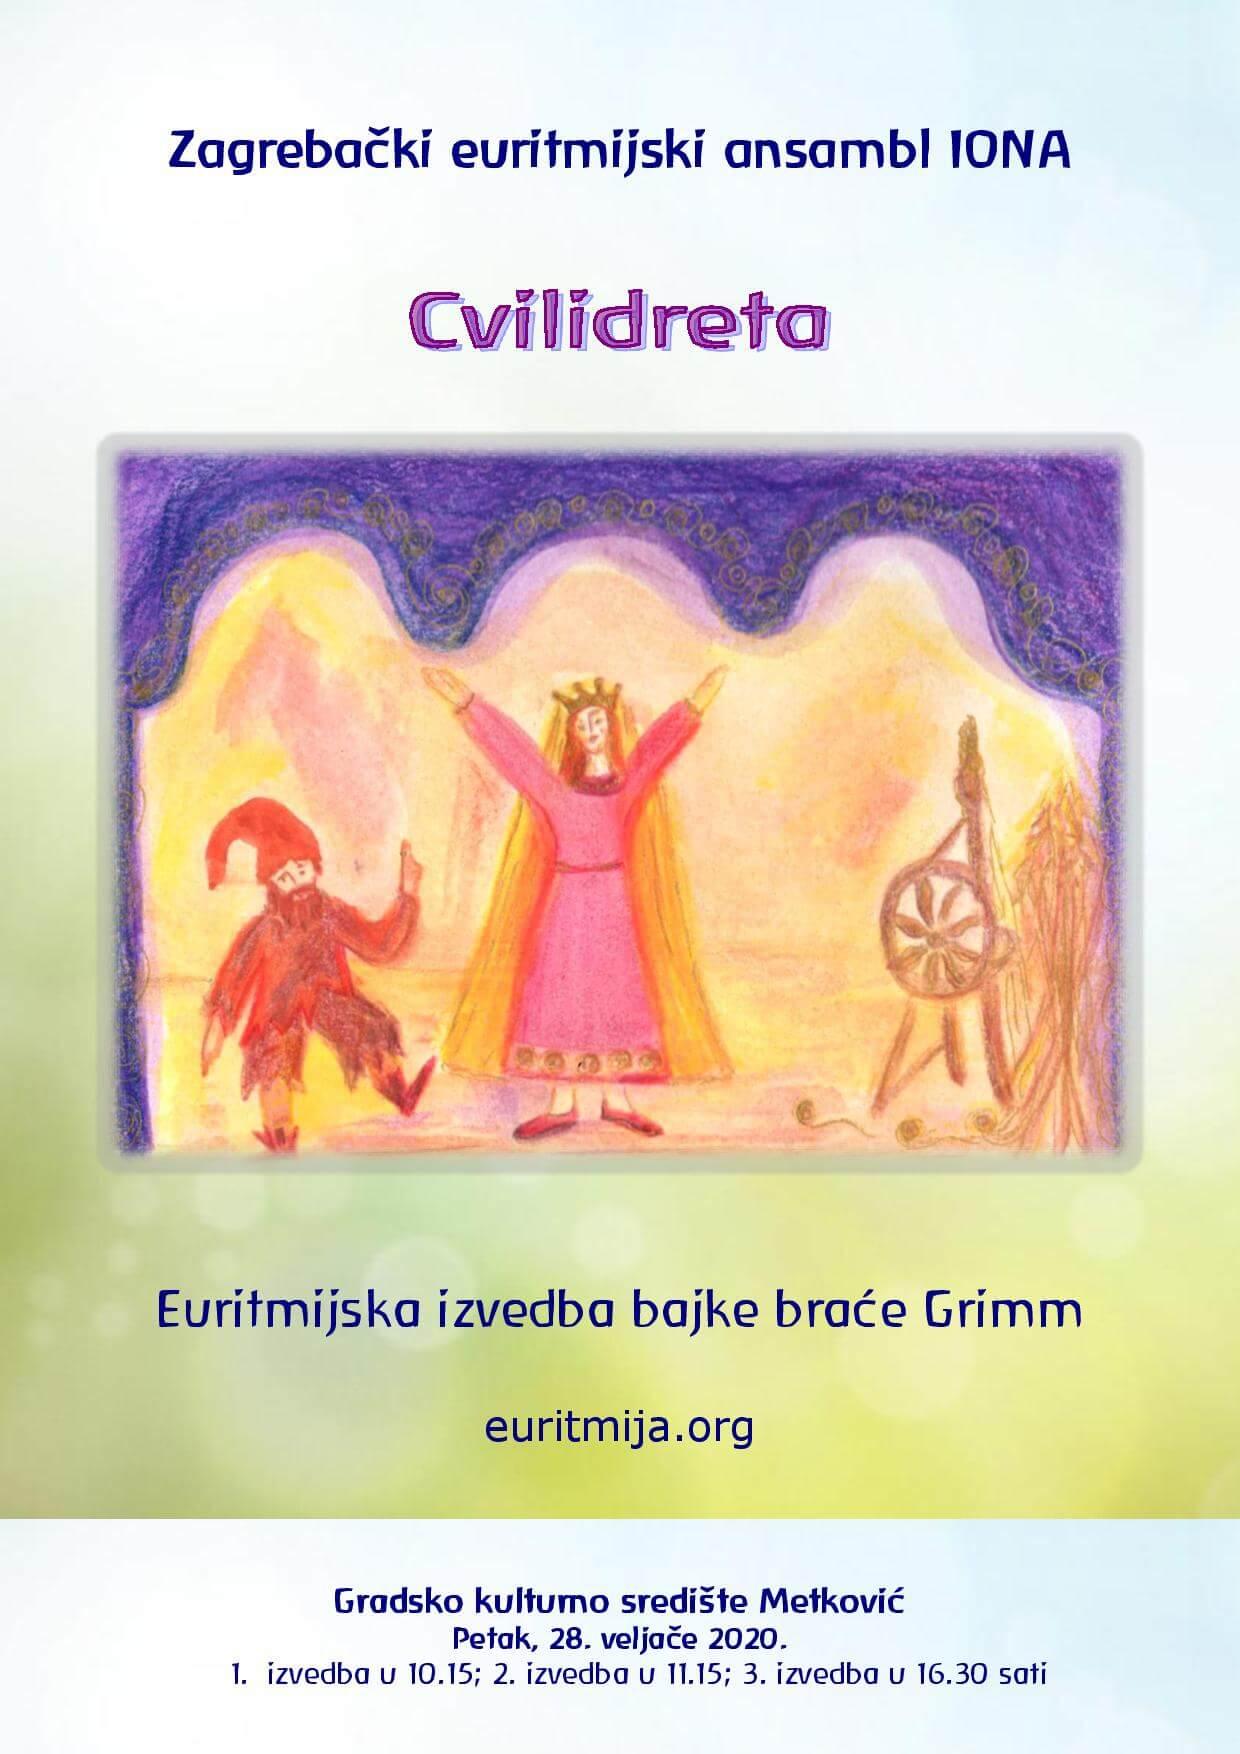 Plakat Cvilidreta, Metkovic